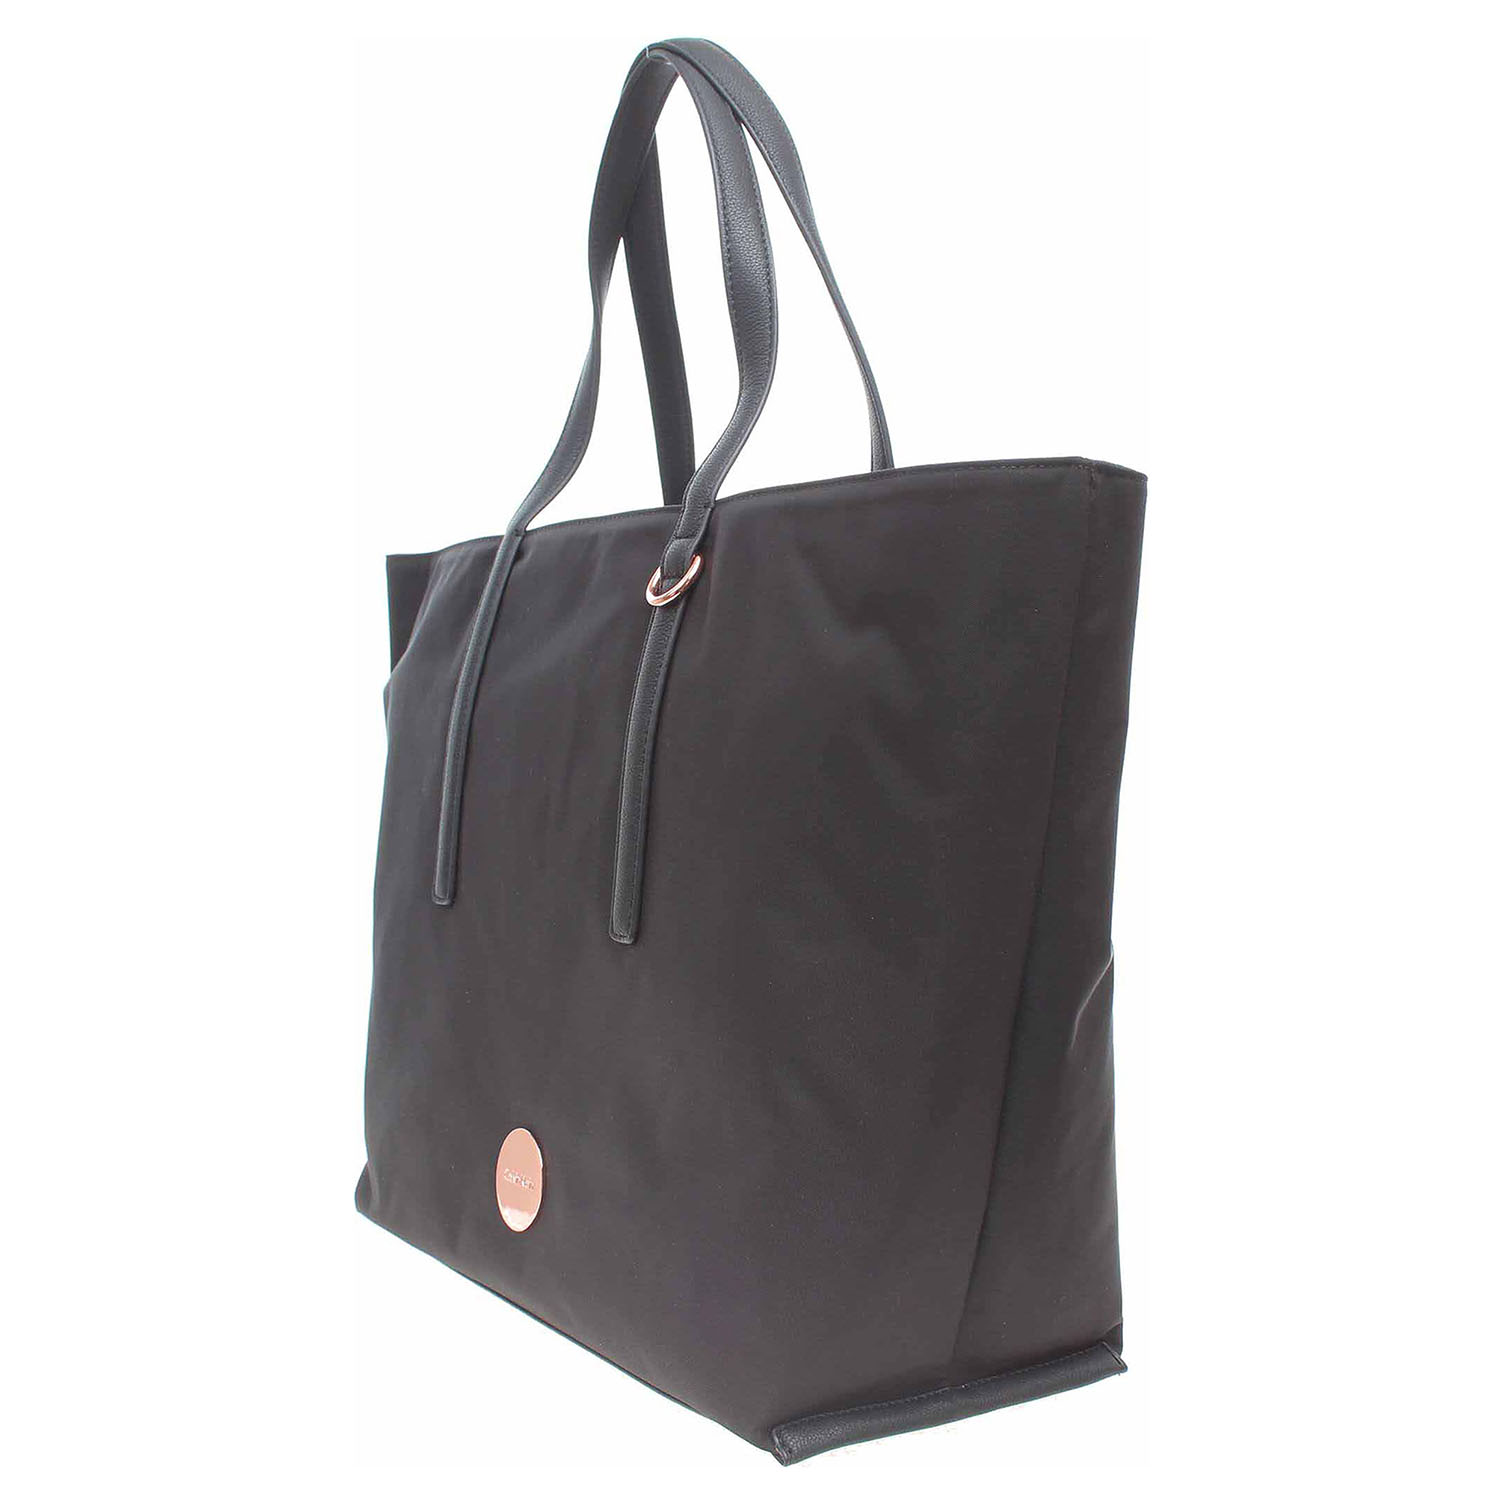 Ecco Calvin Klein dámská kabelka K60K602635001 černá 11891166